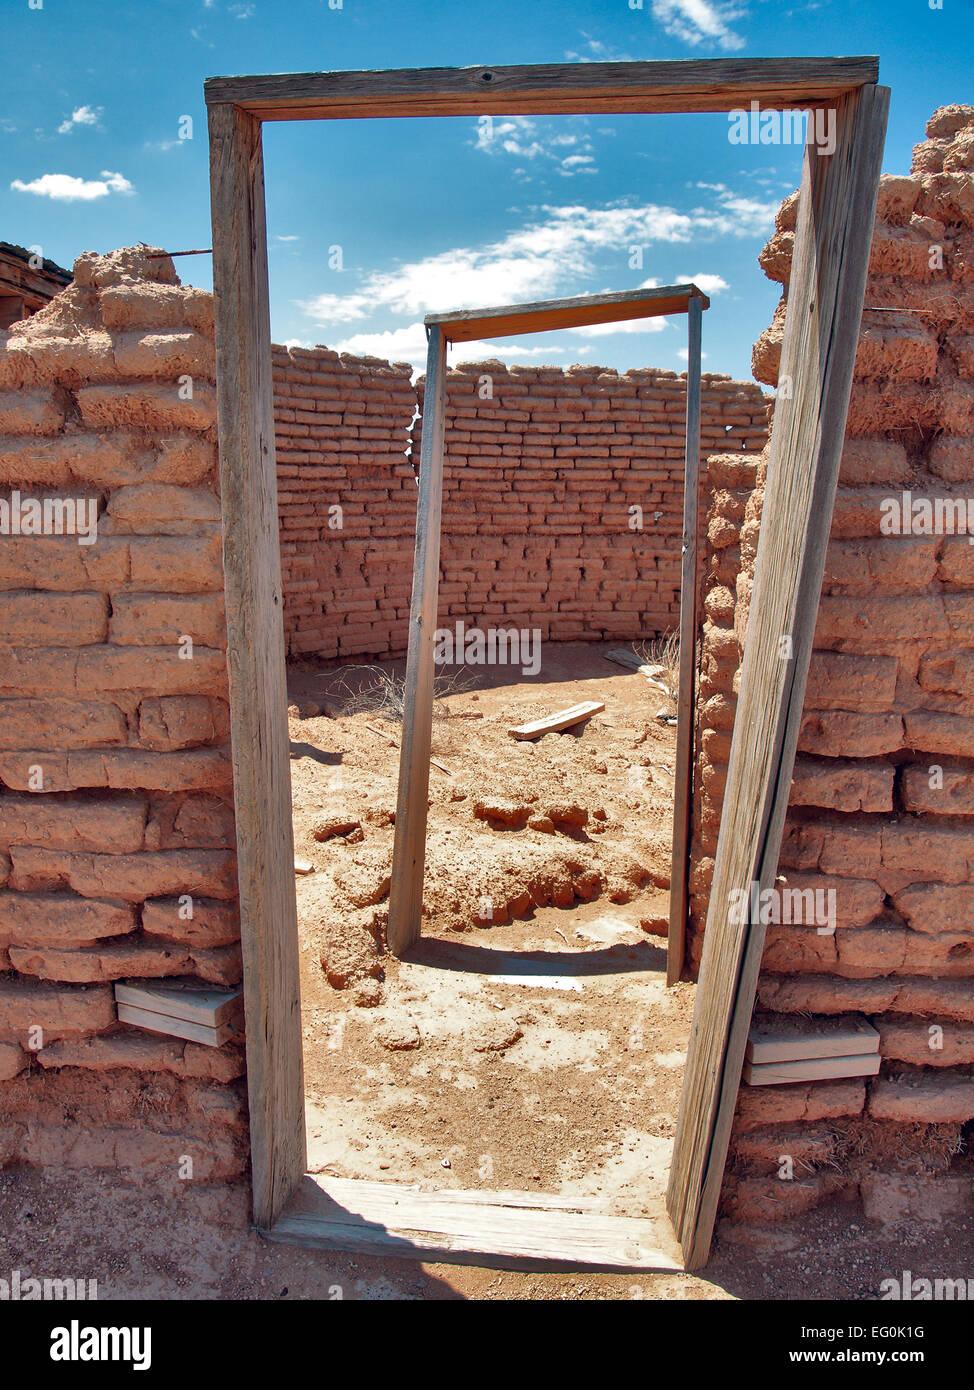 USA, Arizona, Yuma County, Aztec, Doorway frames of abandoned brick building - Stock Image